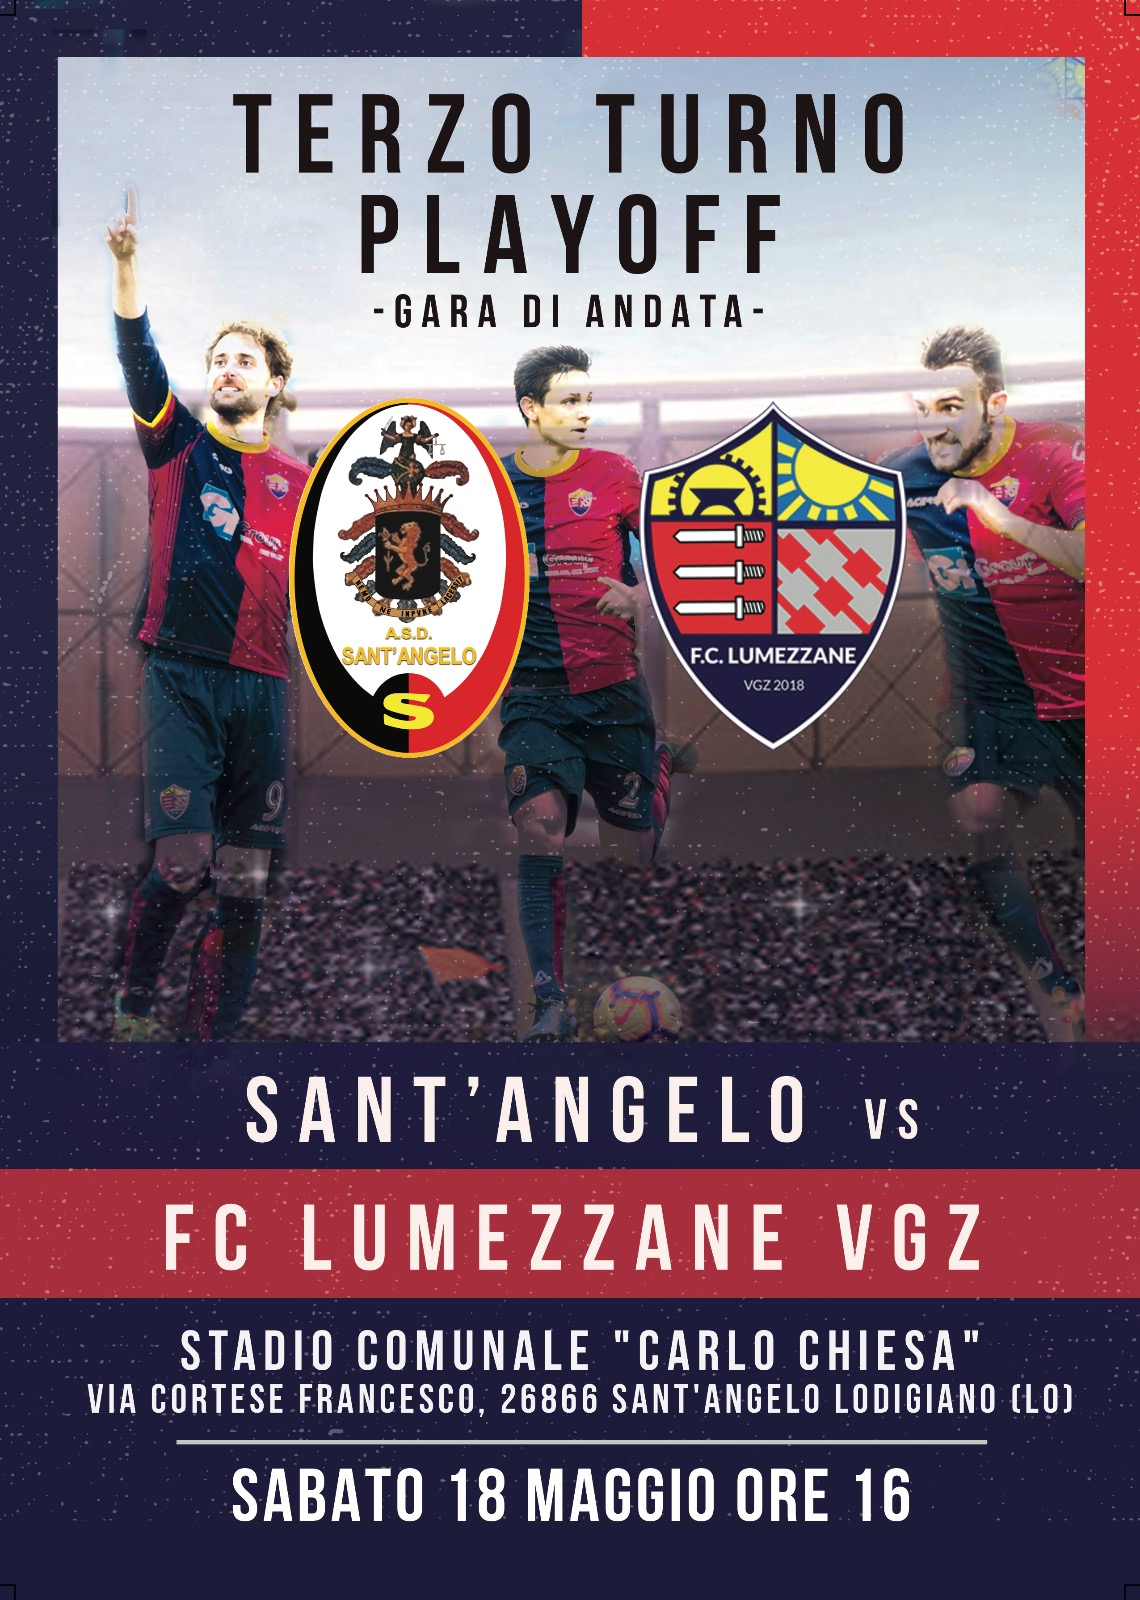 TERZO TURNO PLAYOFF- Sant'Angelo VS Fc Lumezzane Vgz